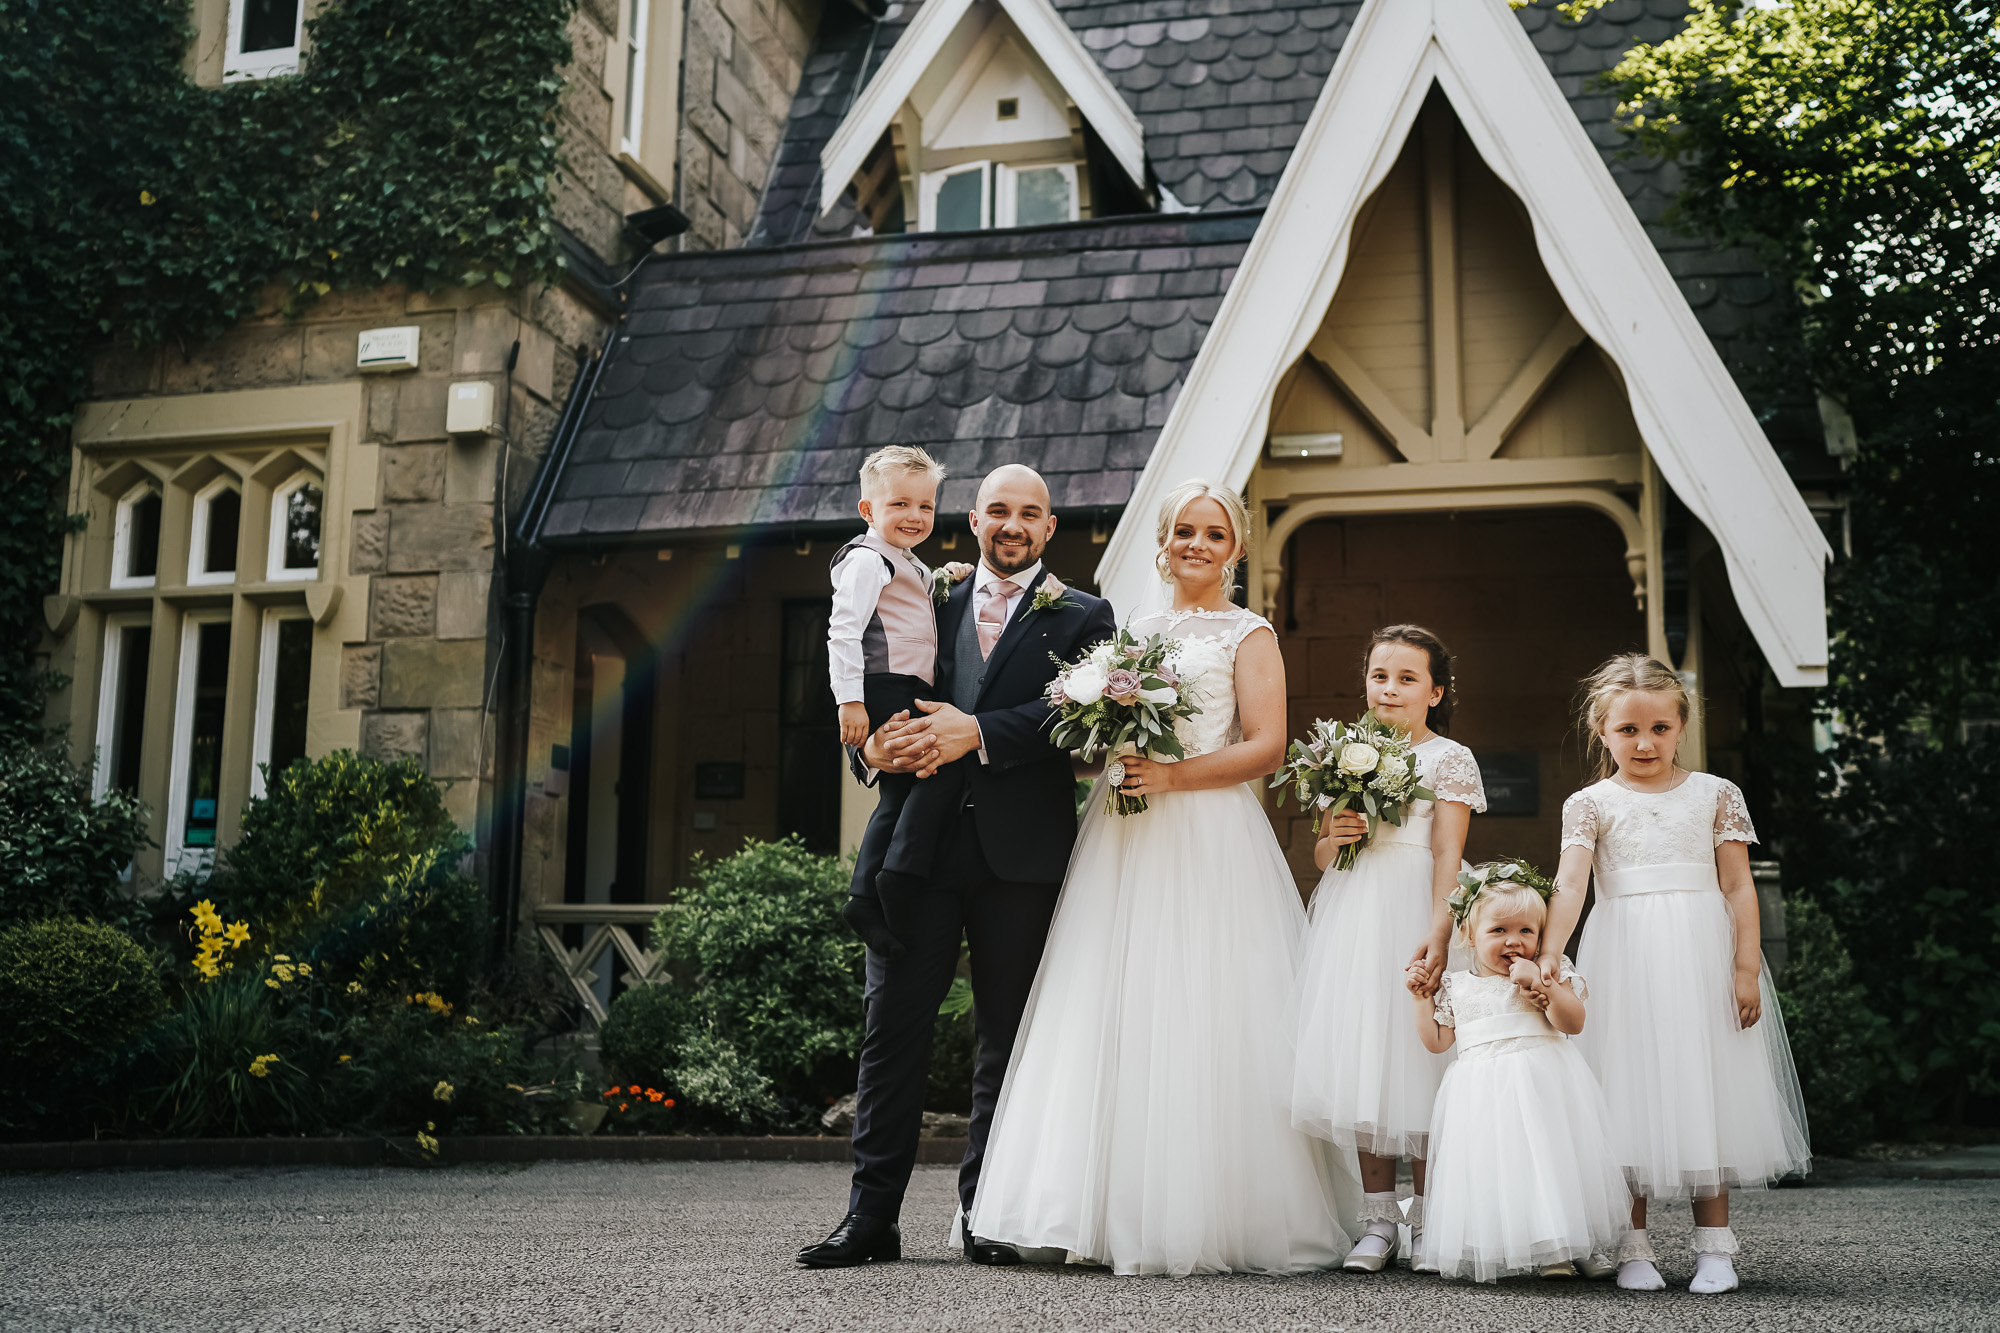 West Tower Wedding Photographer Ormskirk Lancashire wedding photography (35 of 57).jpg